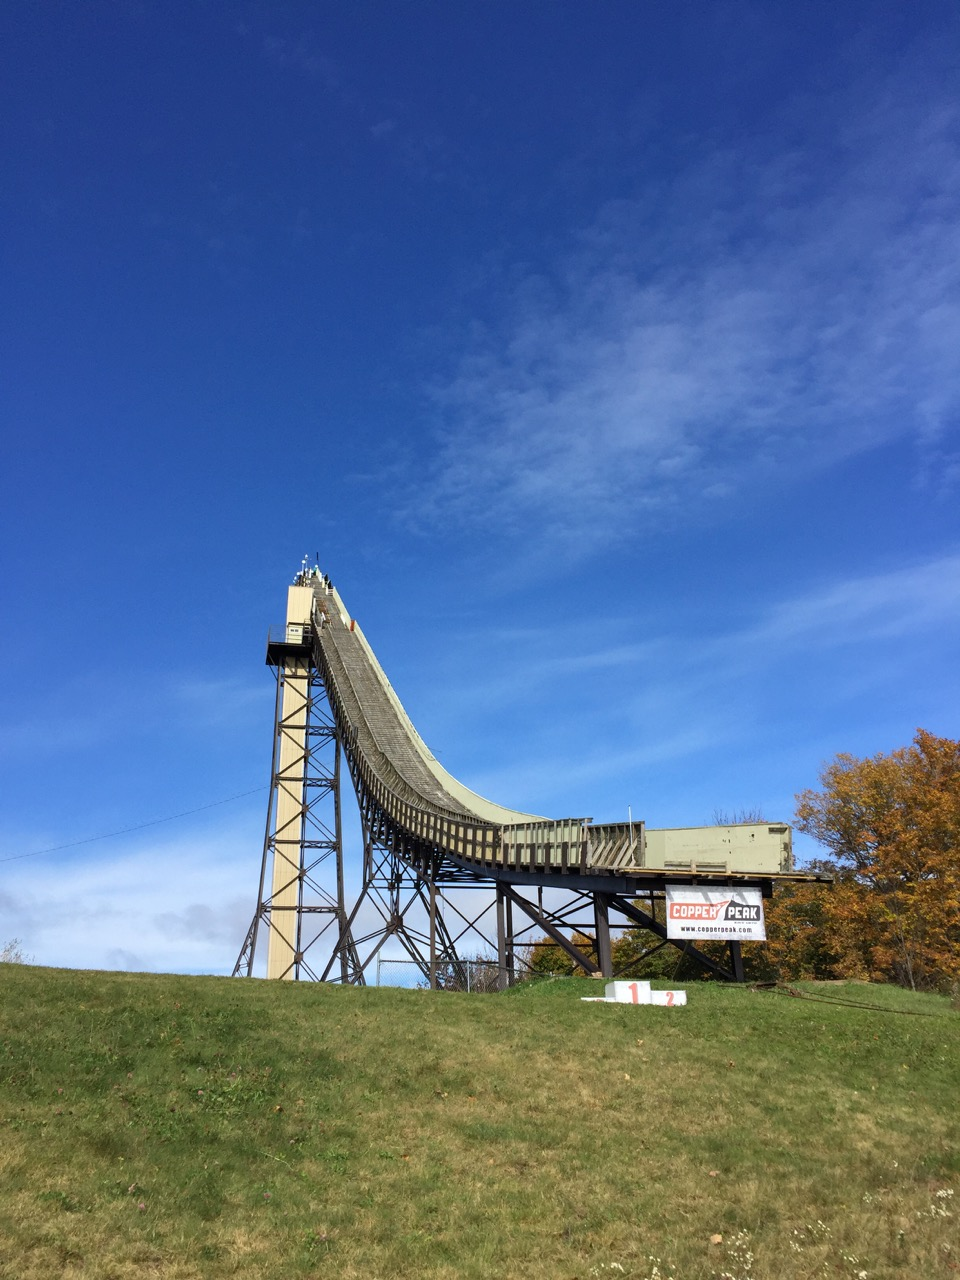 Ski Flying set to return in 2017